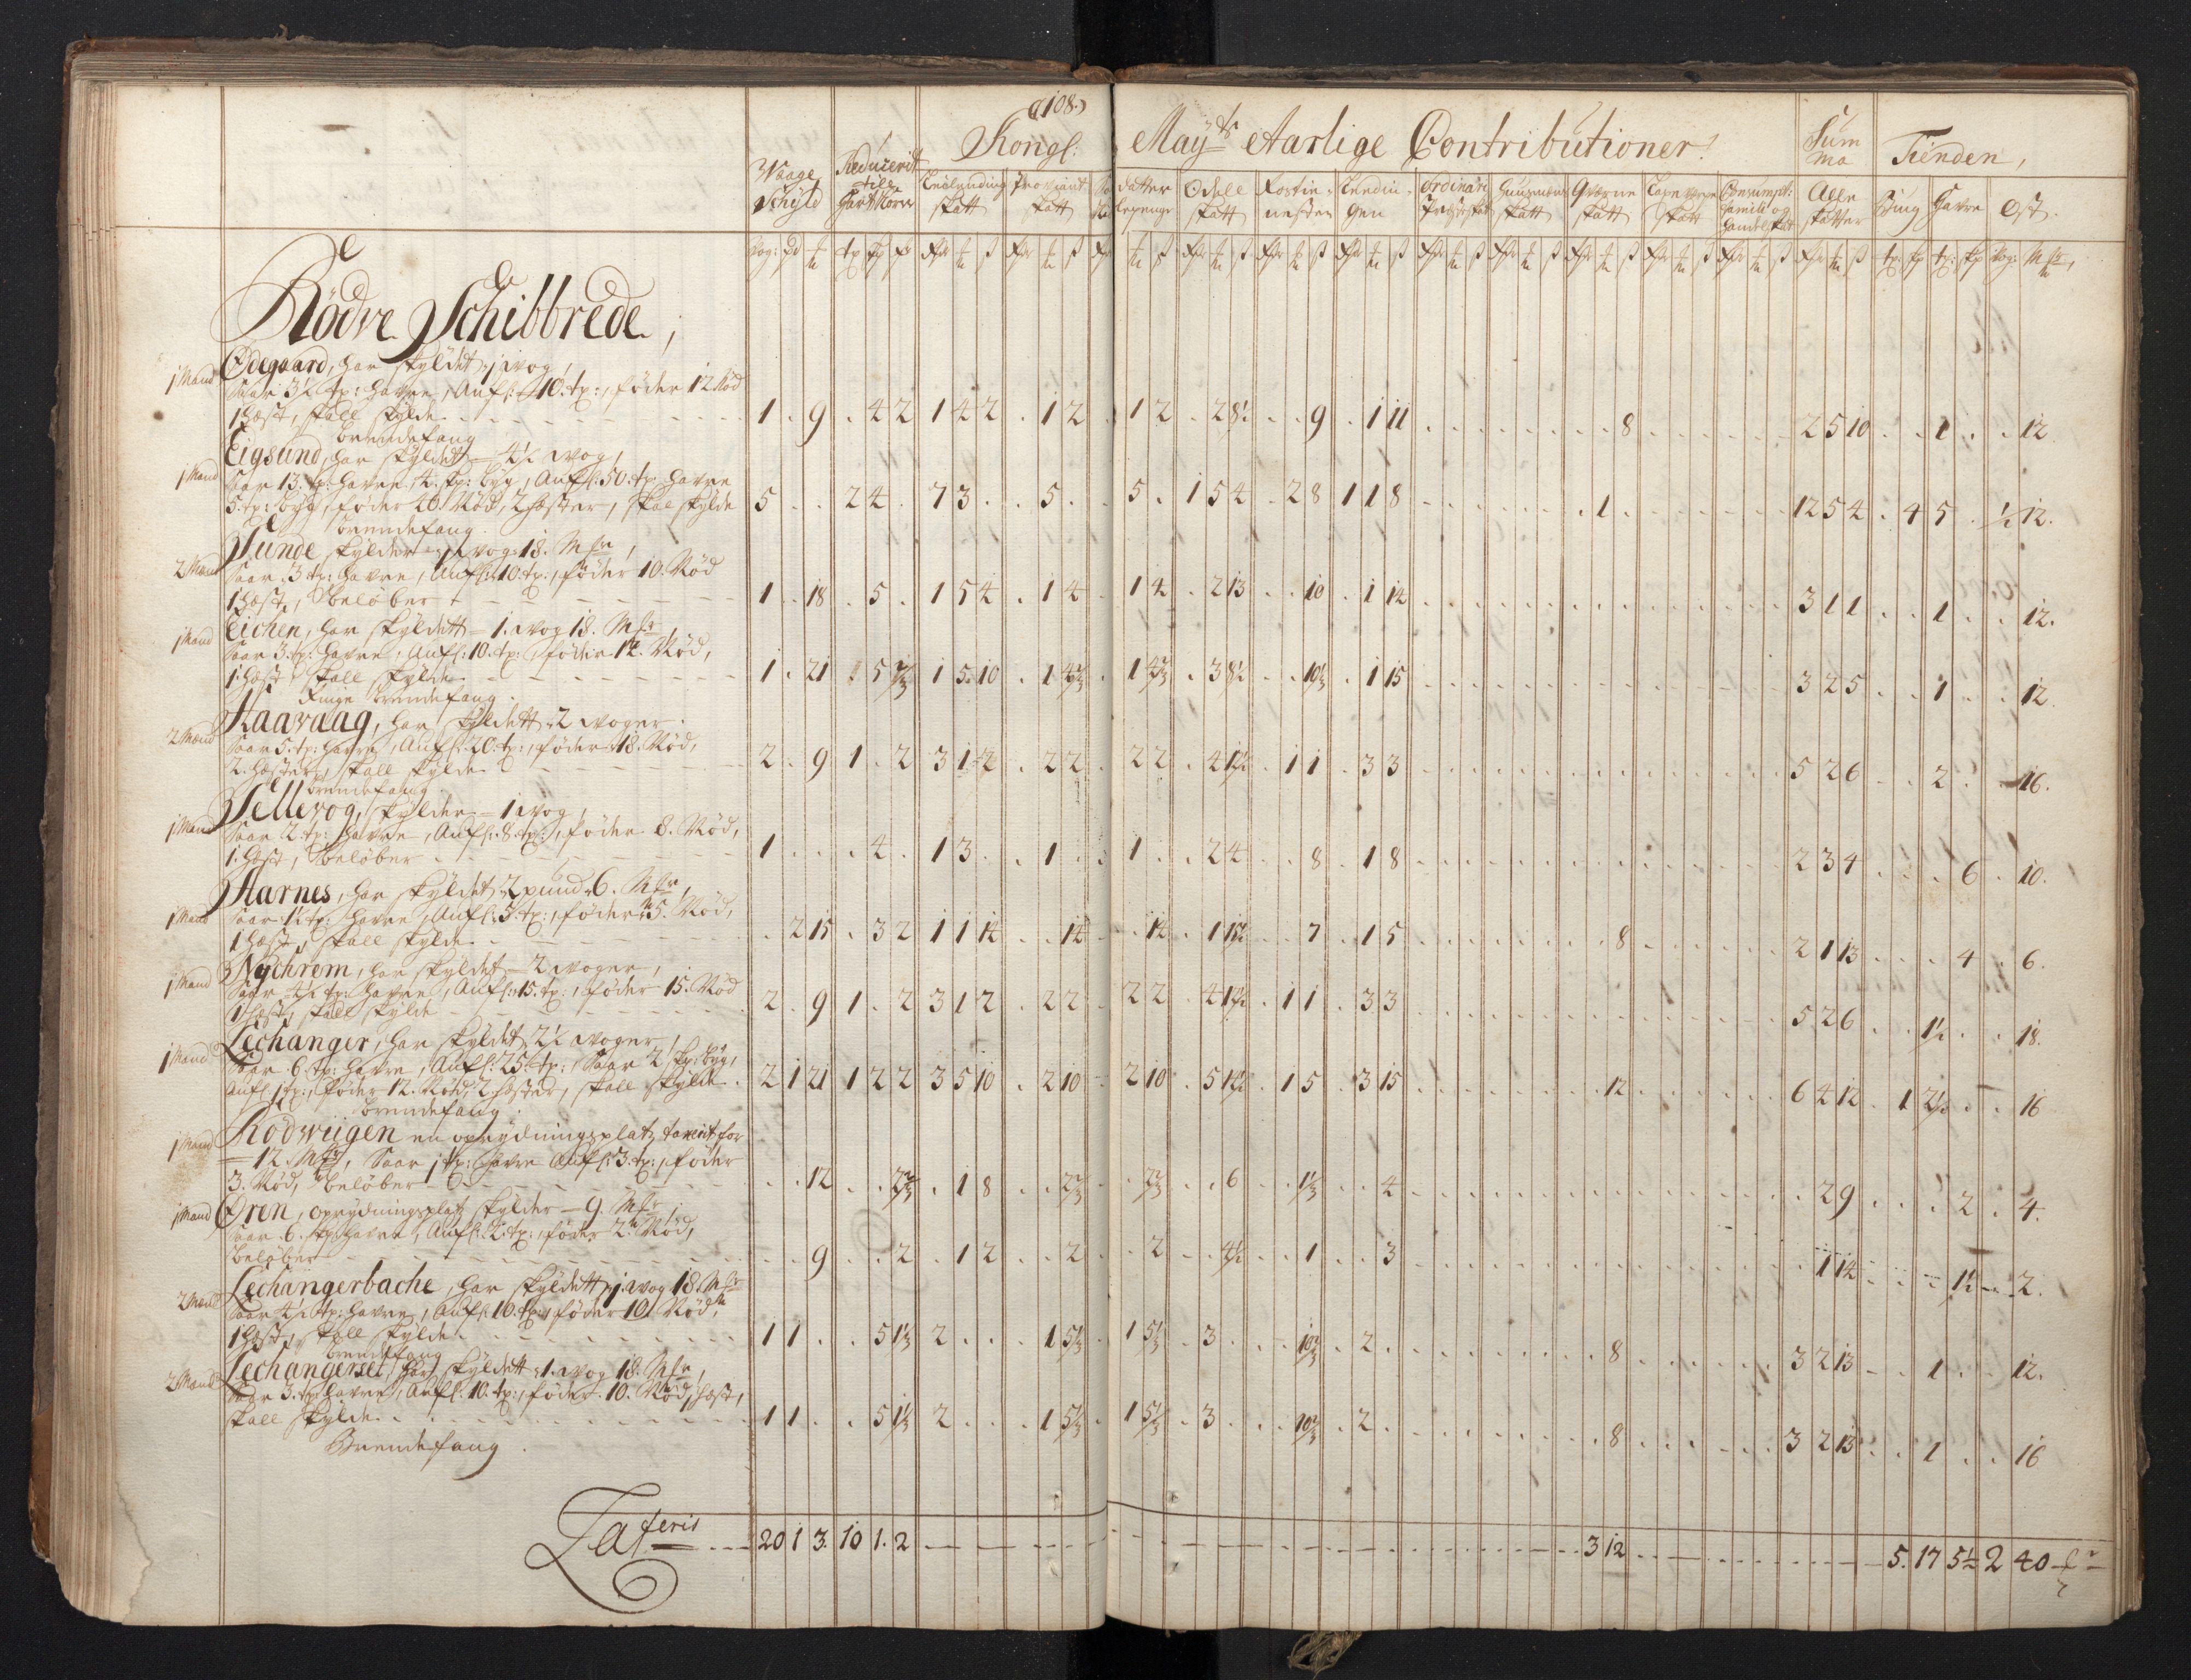 RA, Rentekammeret inntil 1814, Realistisk ordnet avdeling, N/Nb/Nbf/L0149: Sunnmøre, prøvematrikkel, 1714, s. 107b-108a